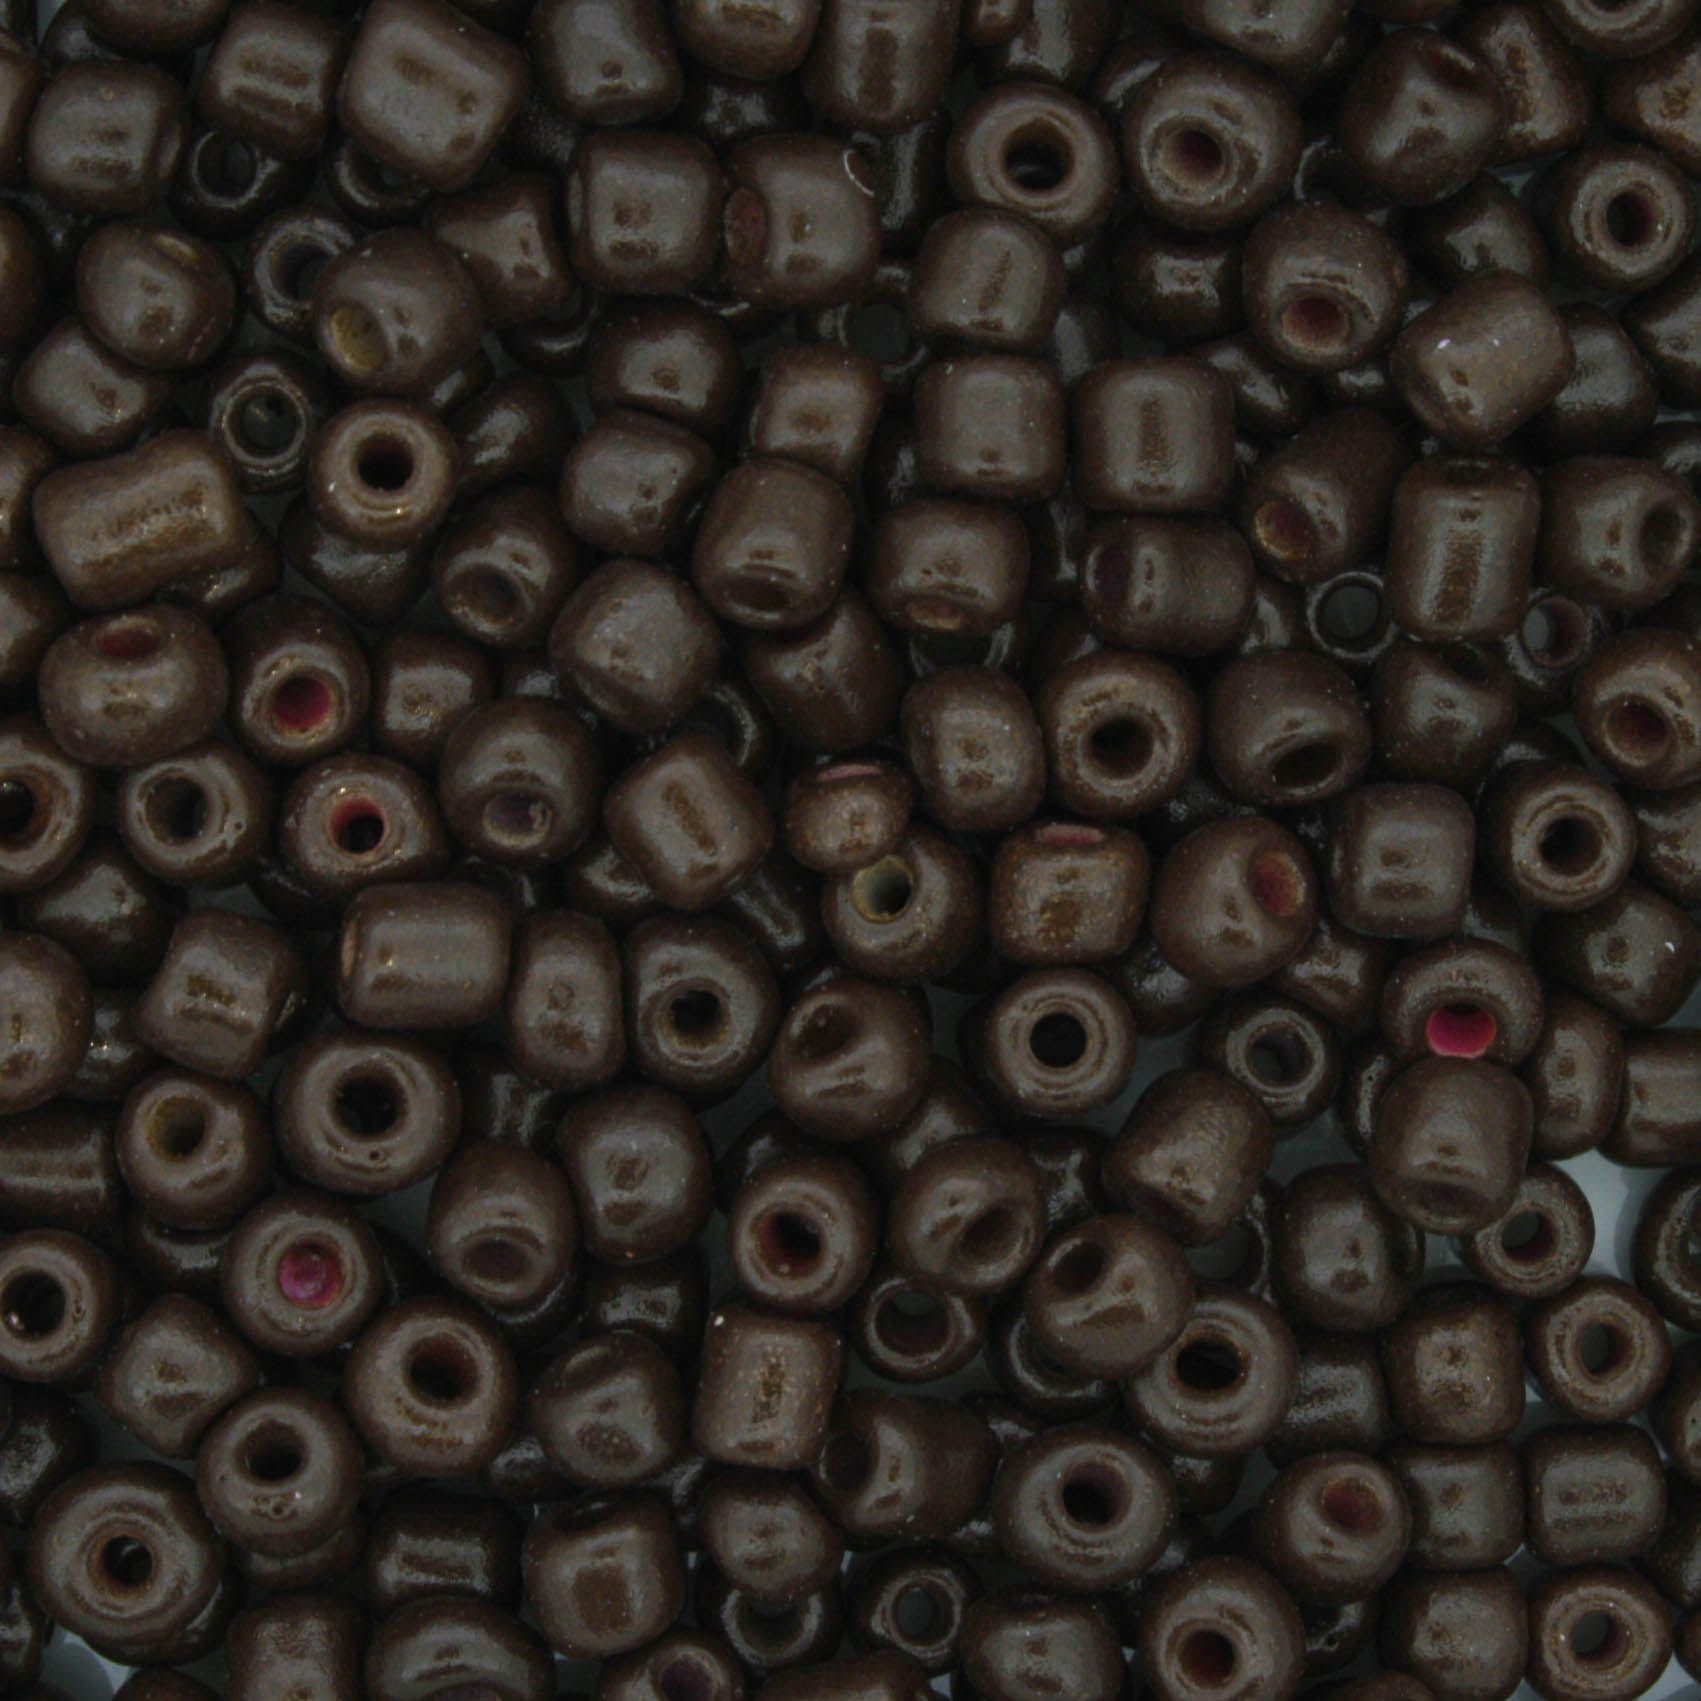 Miçanga - Marrom Escura - 6/0 [4x3mm]  - Stéphanie Bijoux® - Peças para Bijuterias e Artesanato